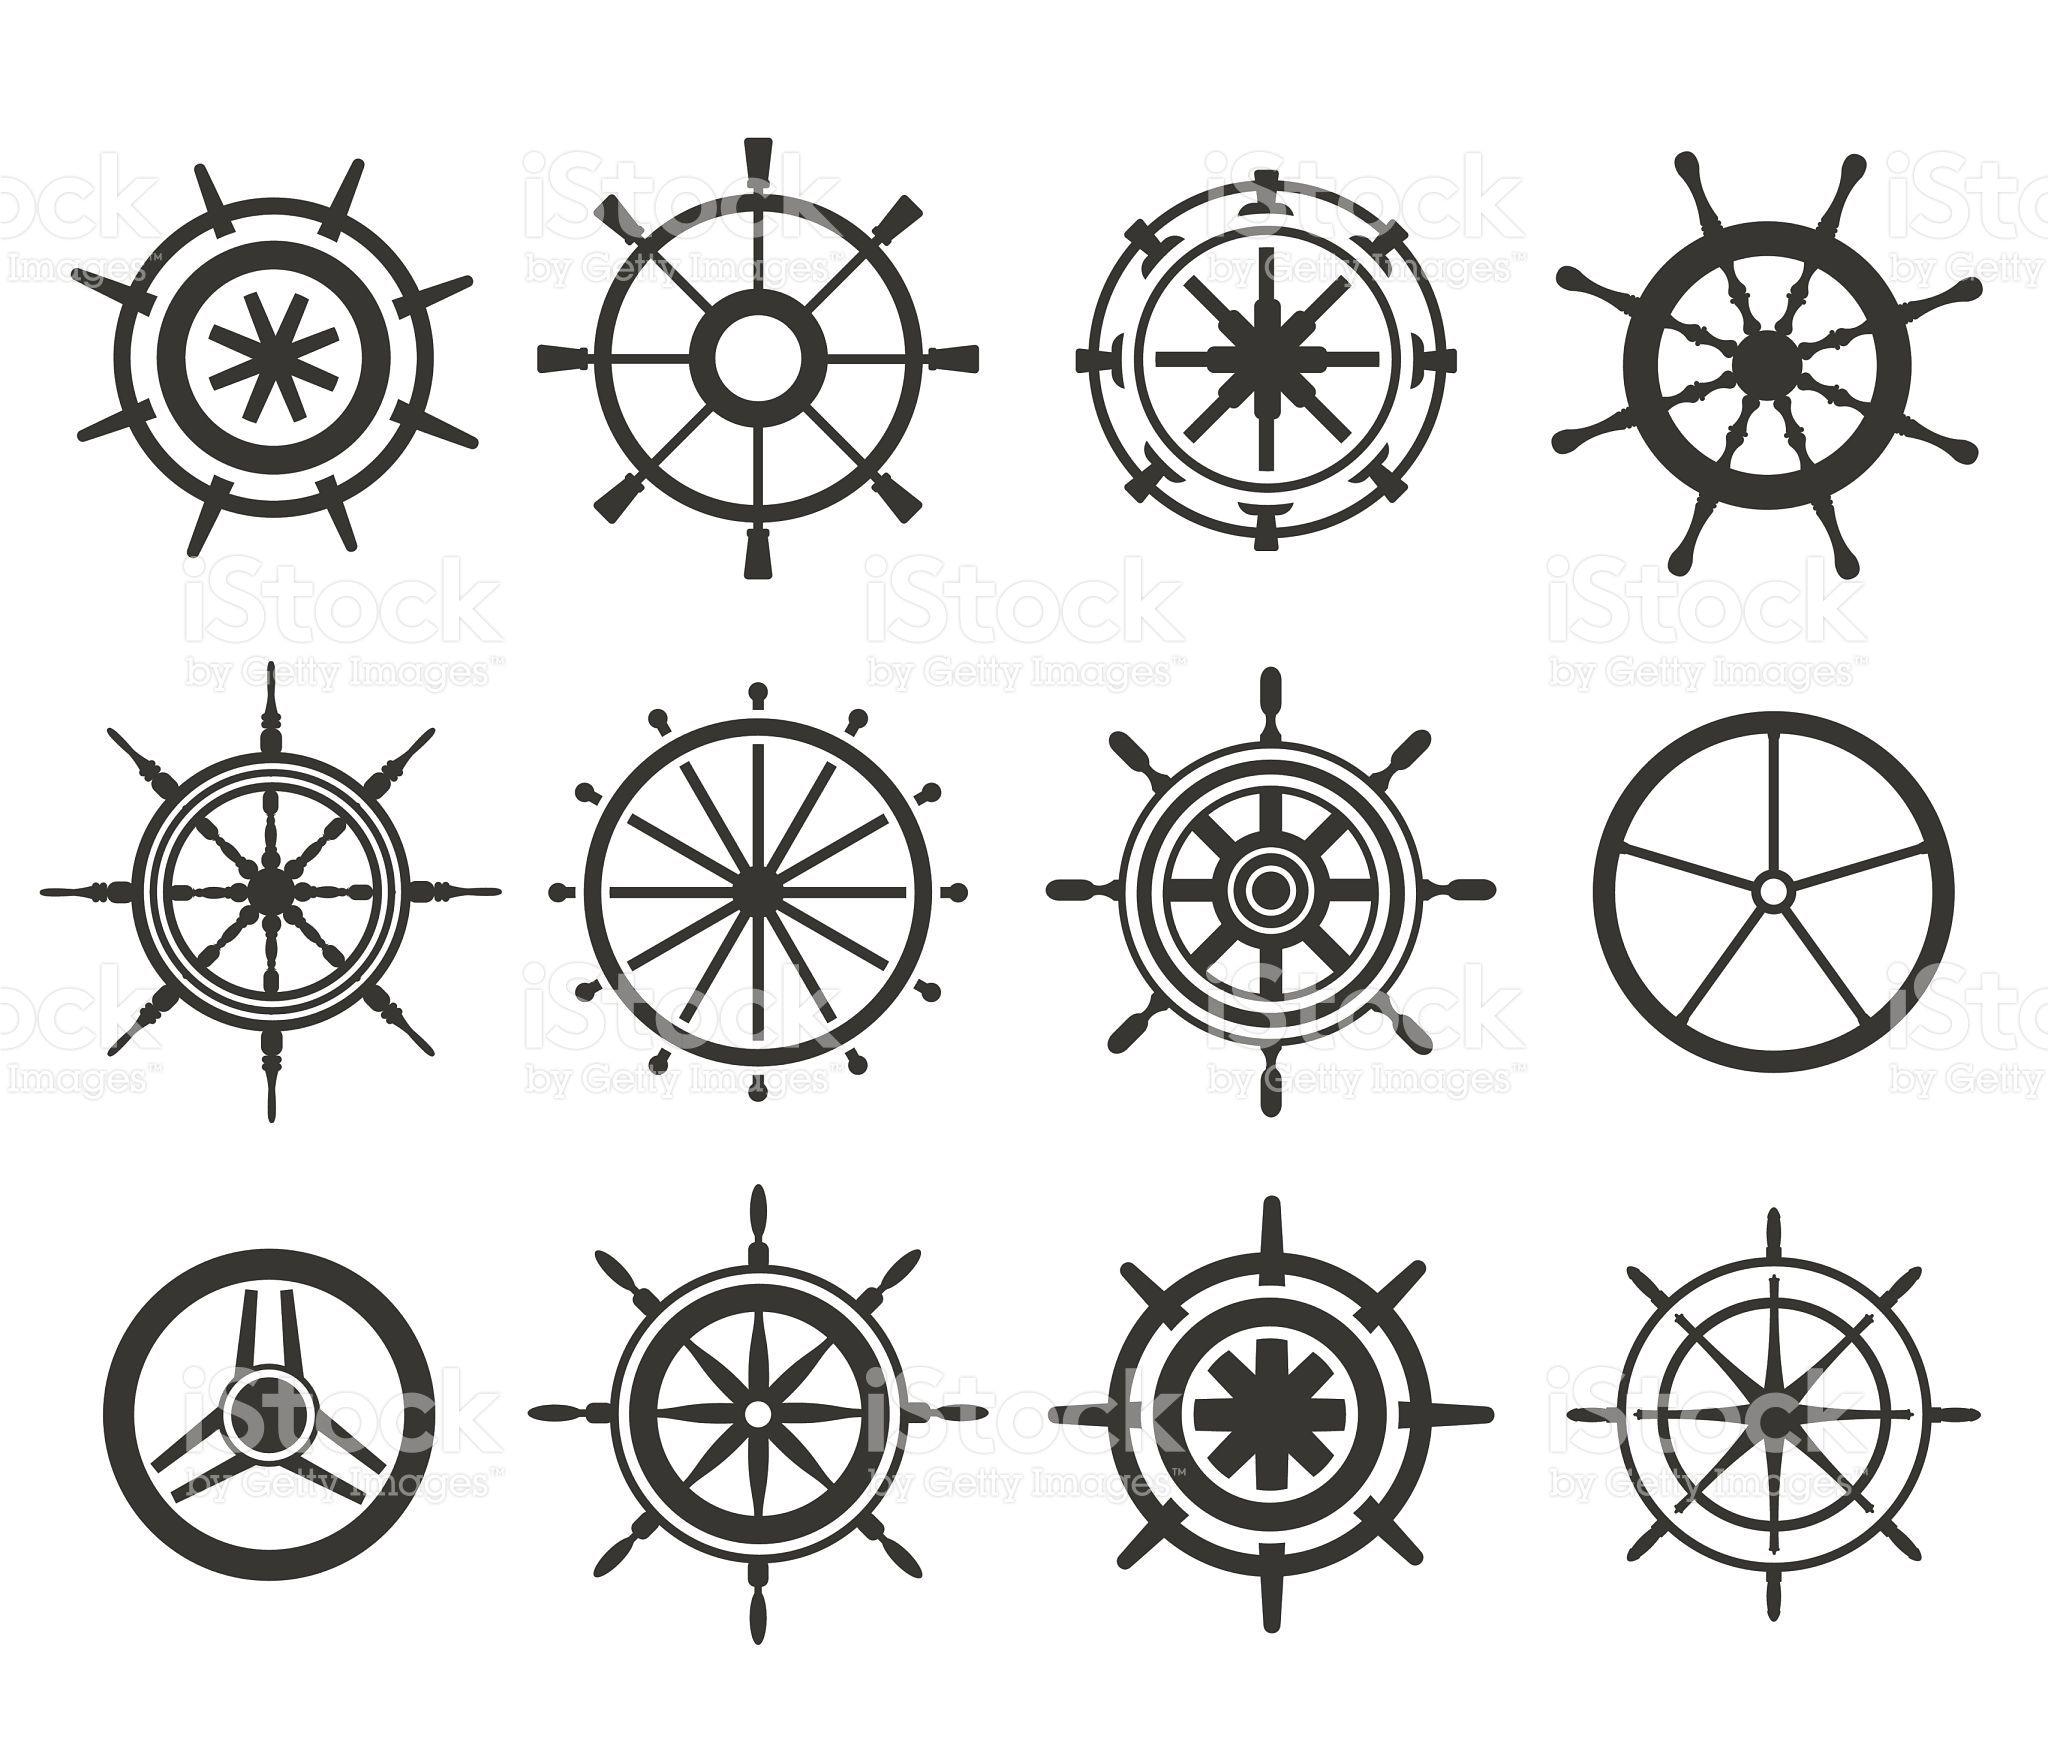 Vector rudder black and white flat icons set. Rudder wheel